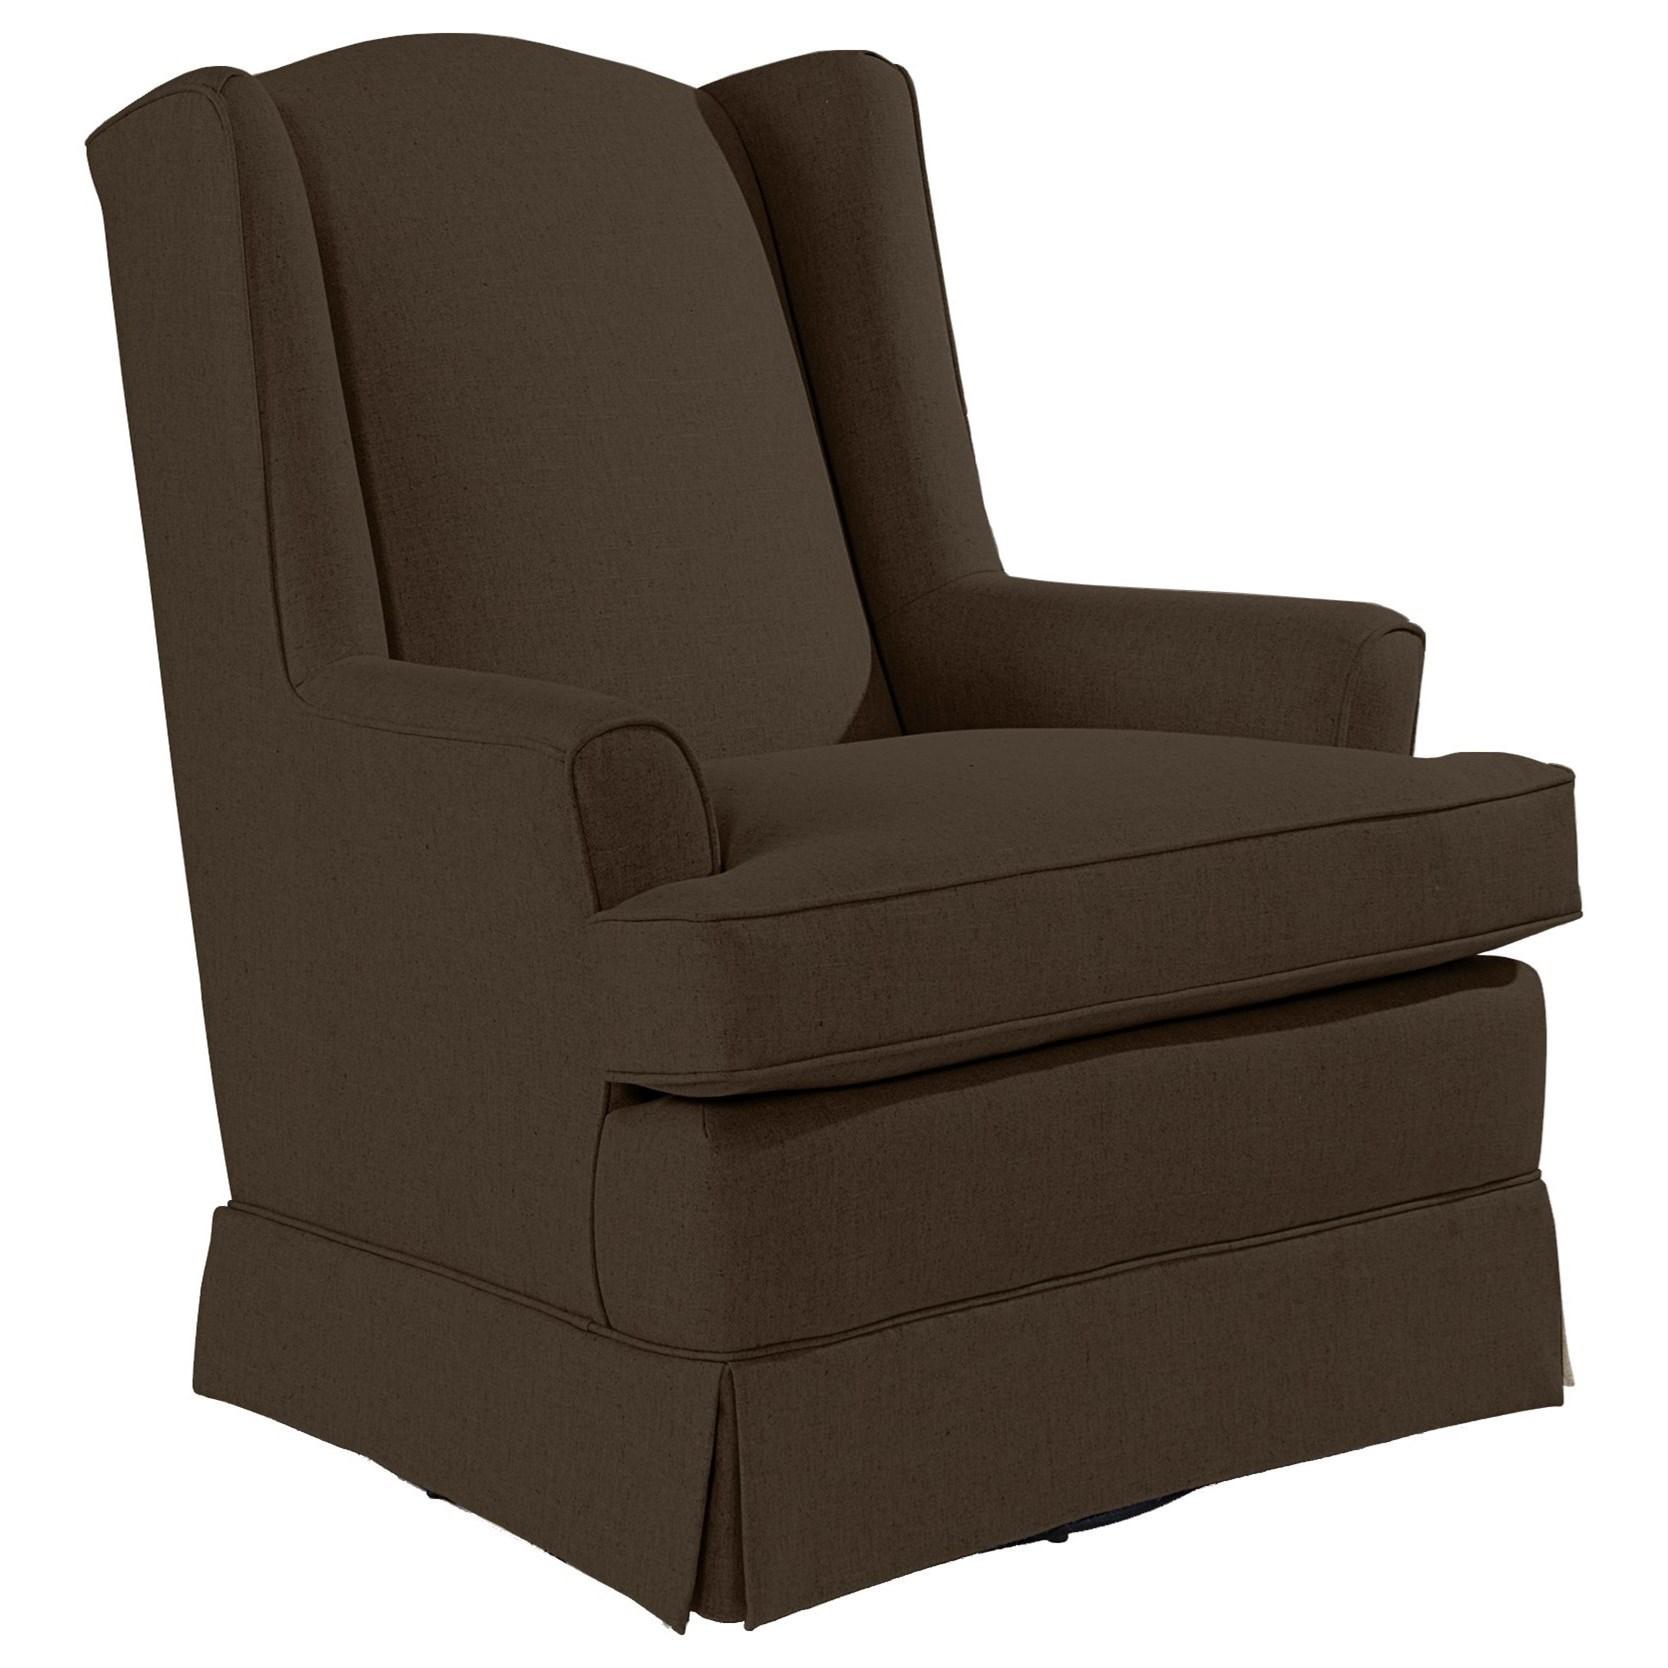 Best Home Furnishings Chairs - Swivel Glide Natasha Swivel Glider - Item Number: -1331134059-23286D